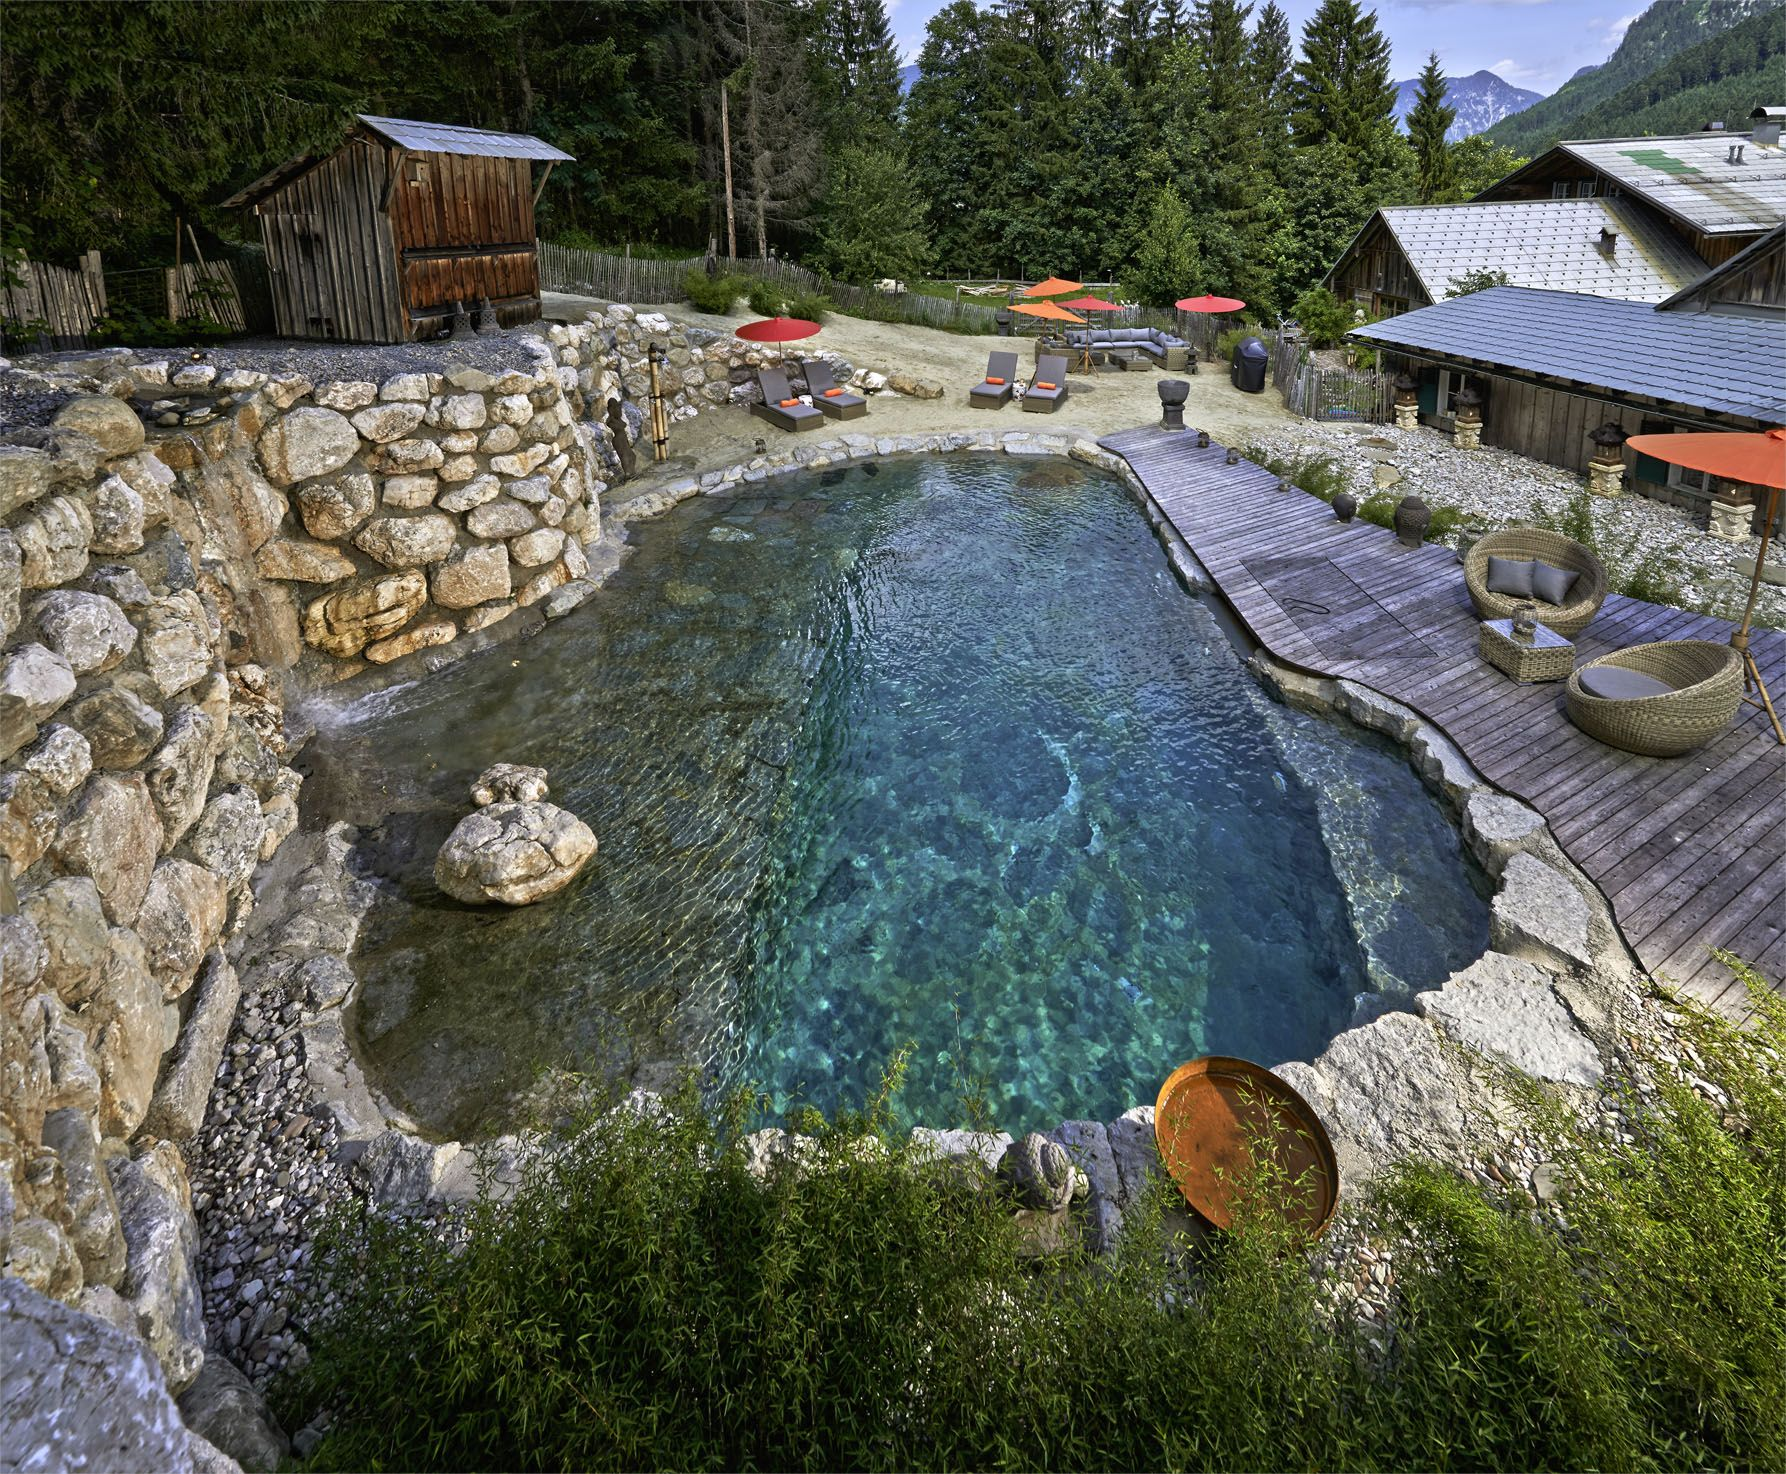 pool selber bauen beton - Google-Suche | Pool | Pinterest ...